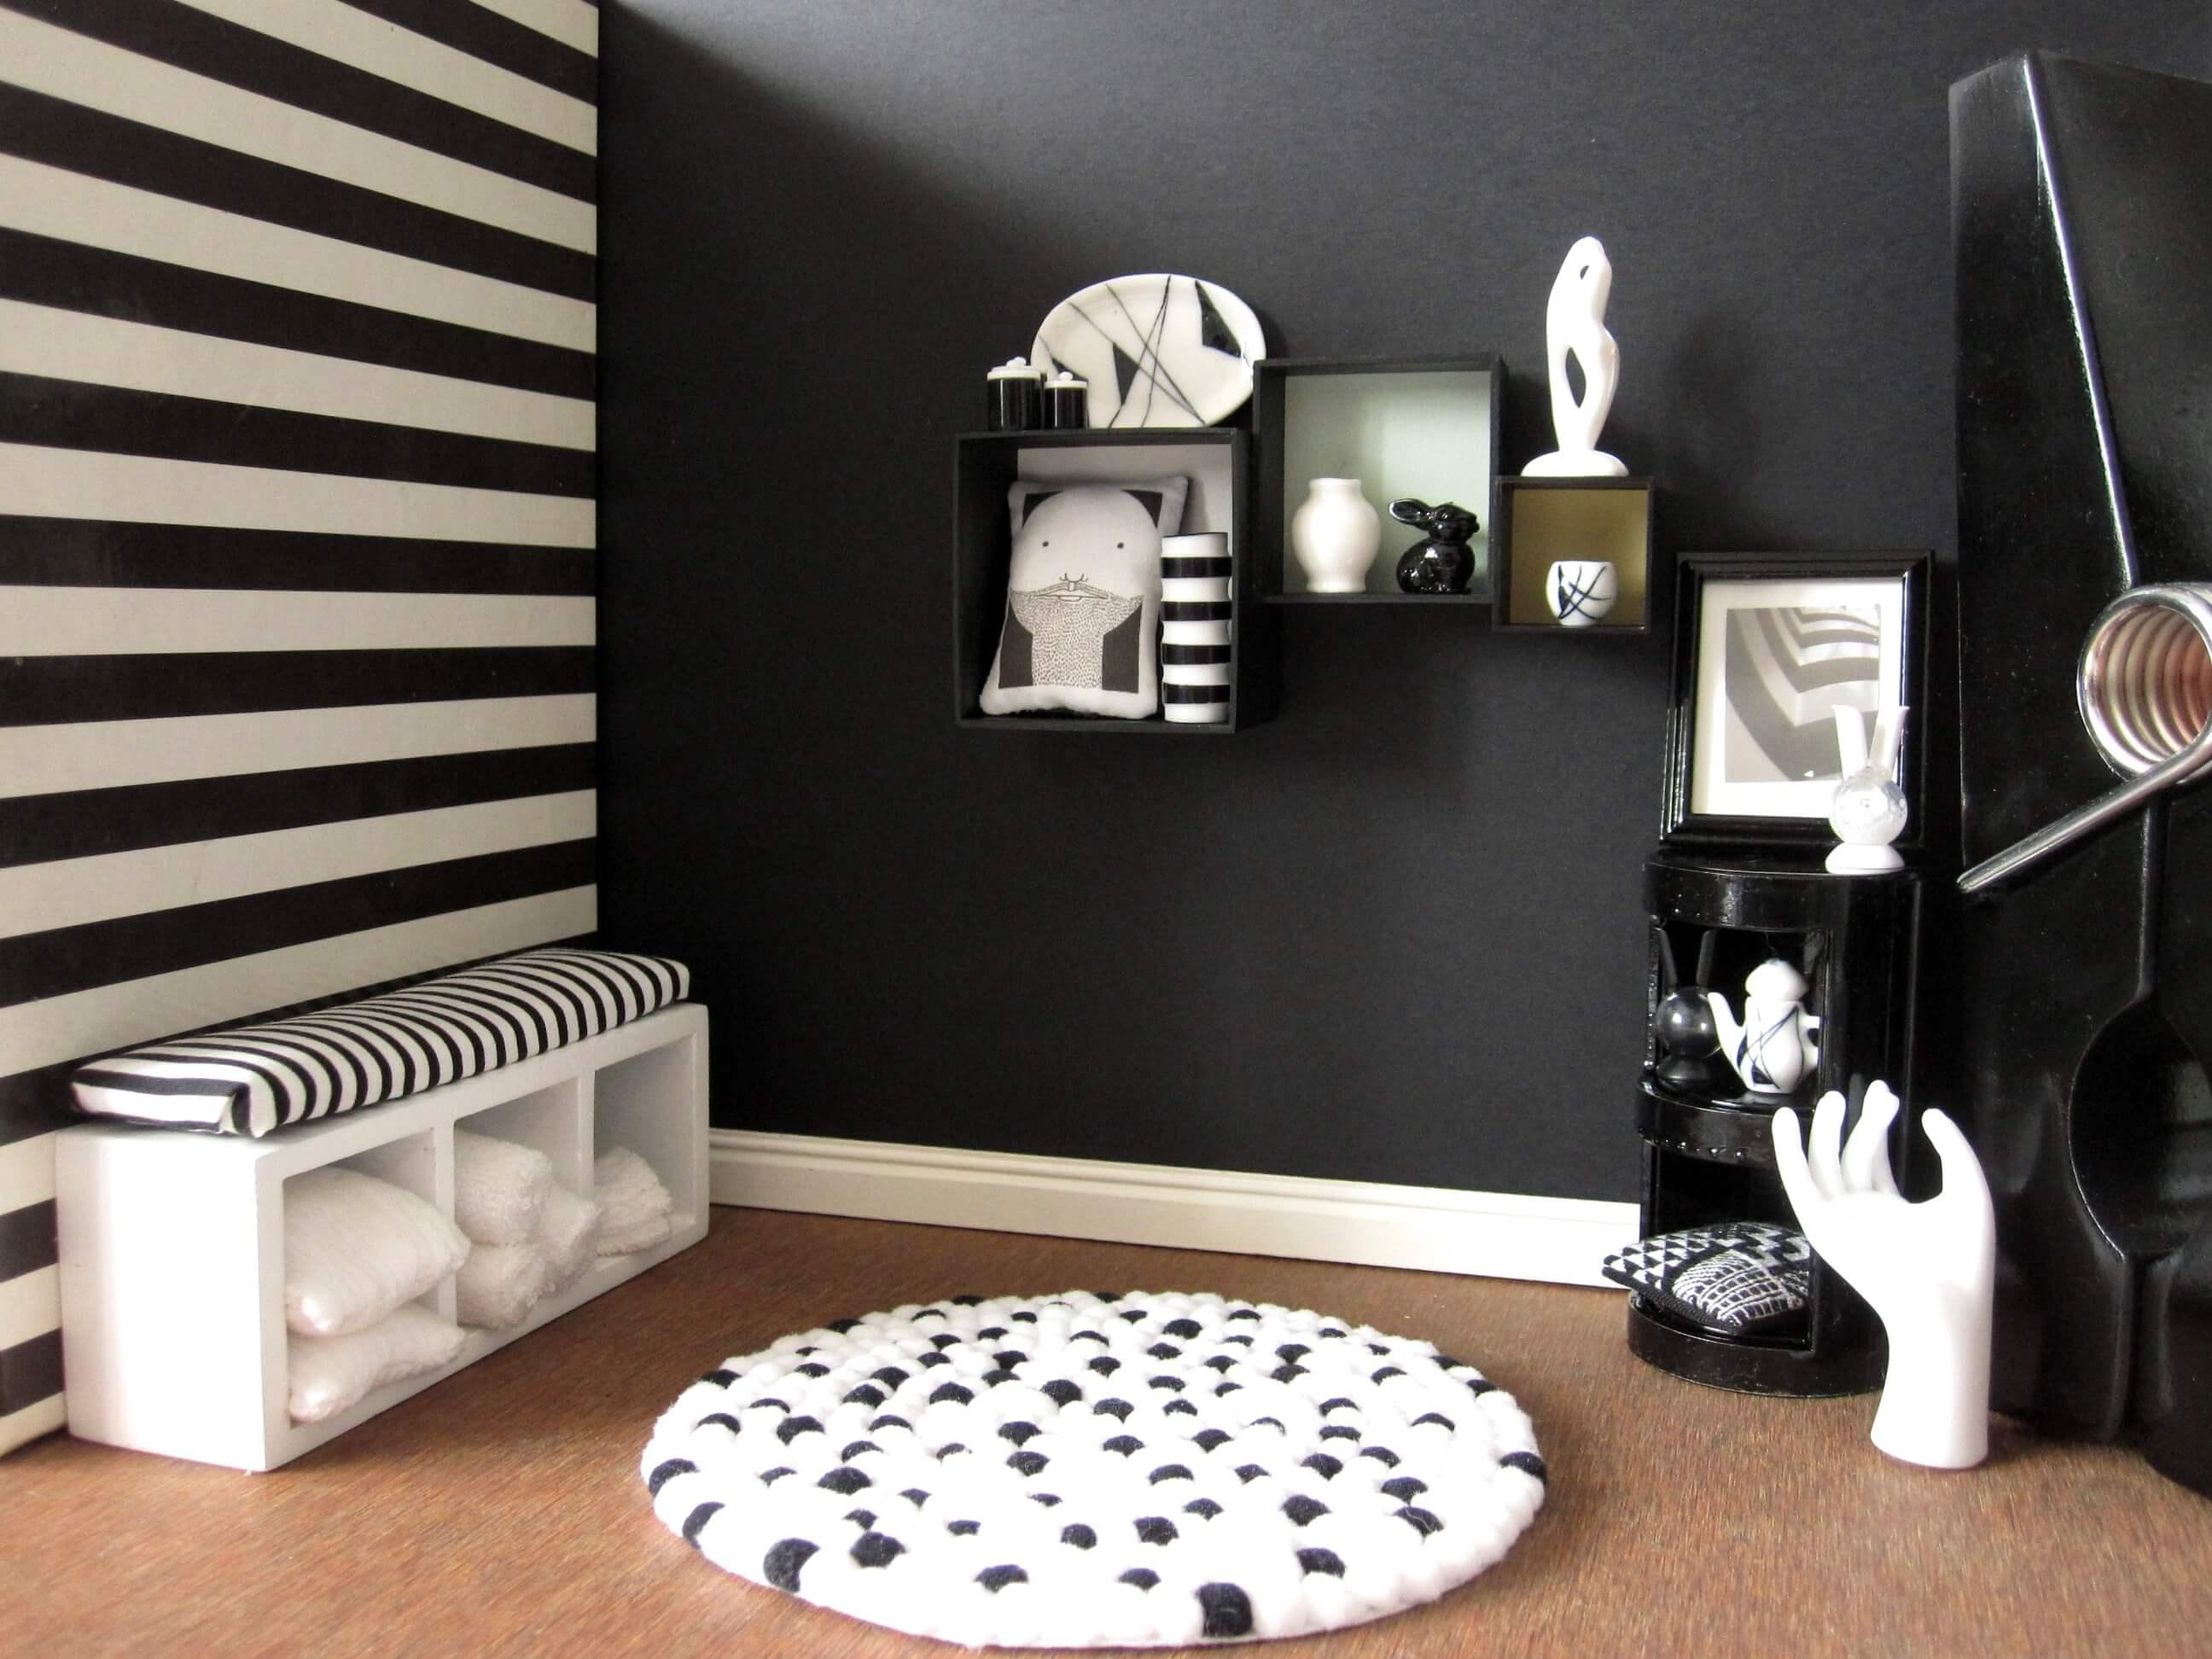 Zwart wit interieur gezellig maken tips inspiratie for Interieur zwart wit